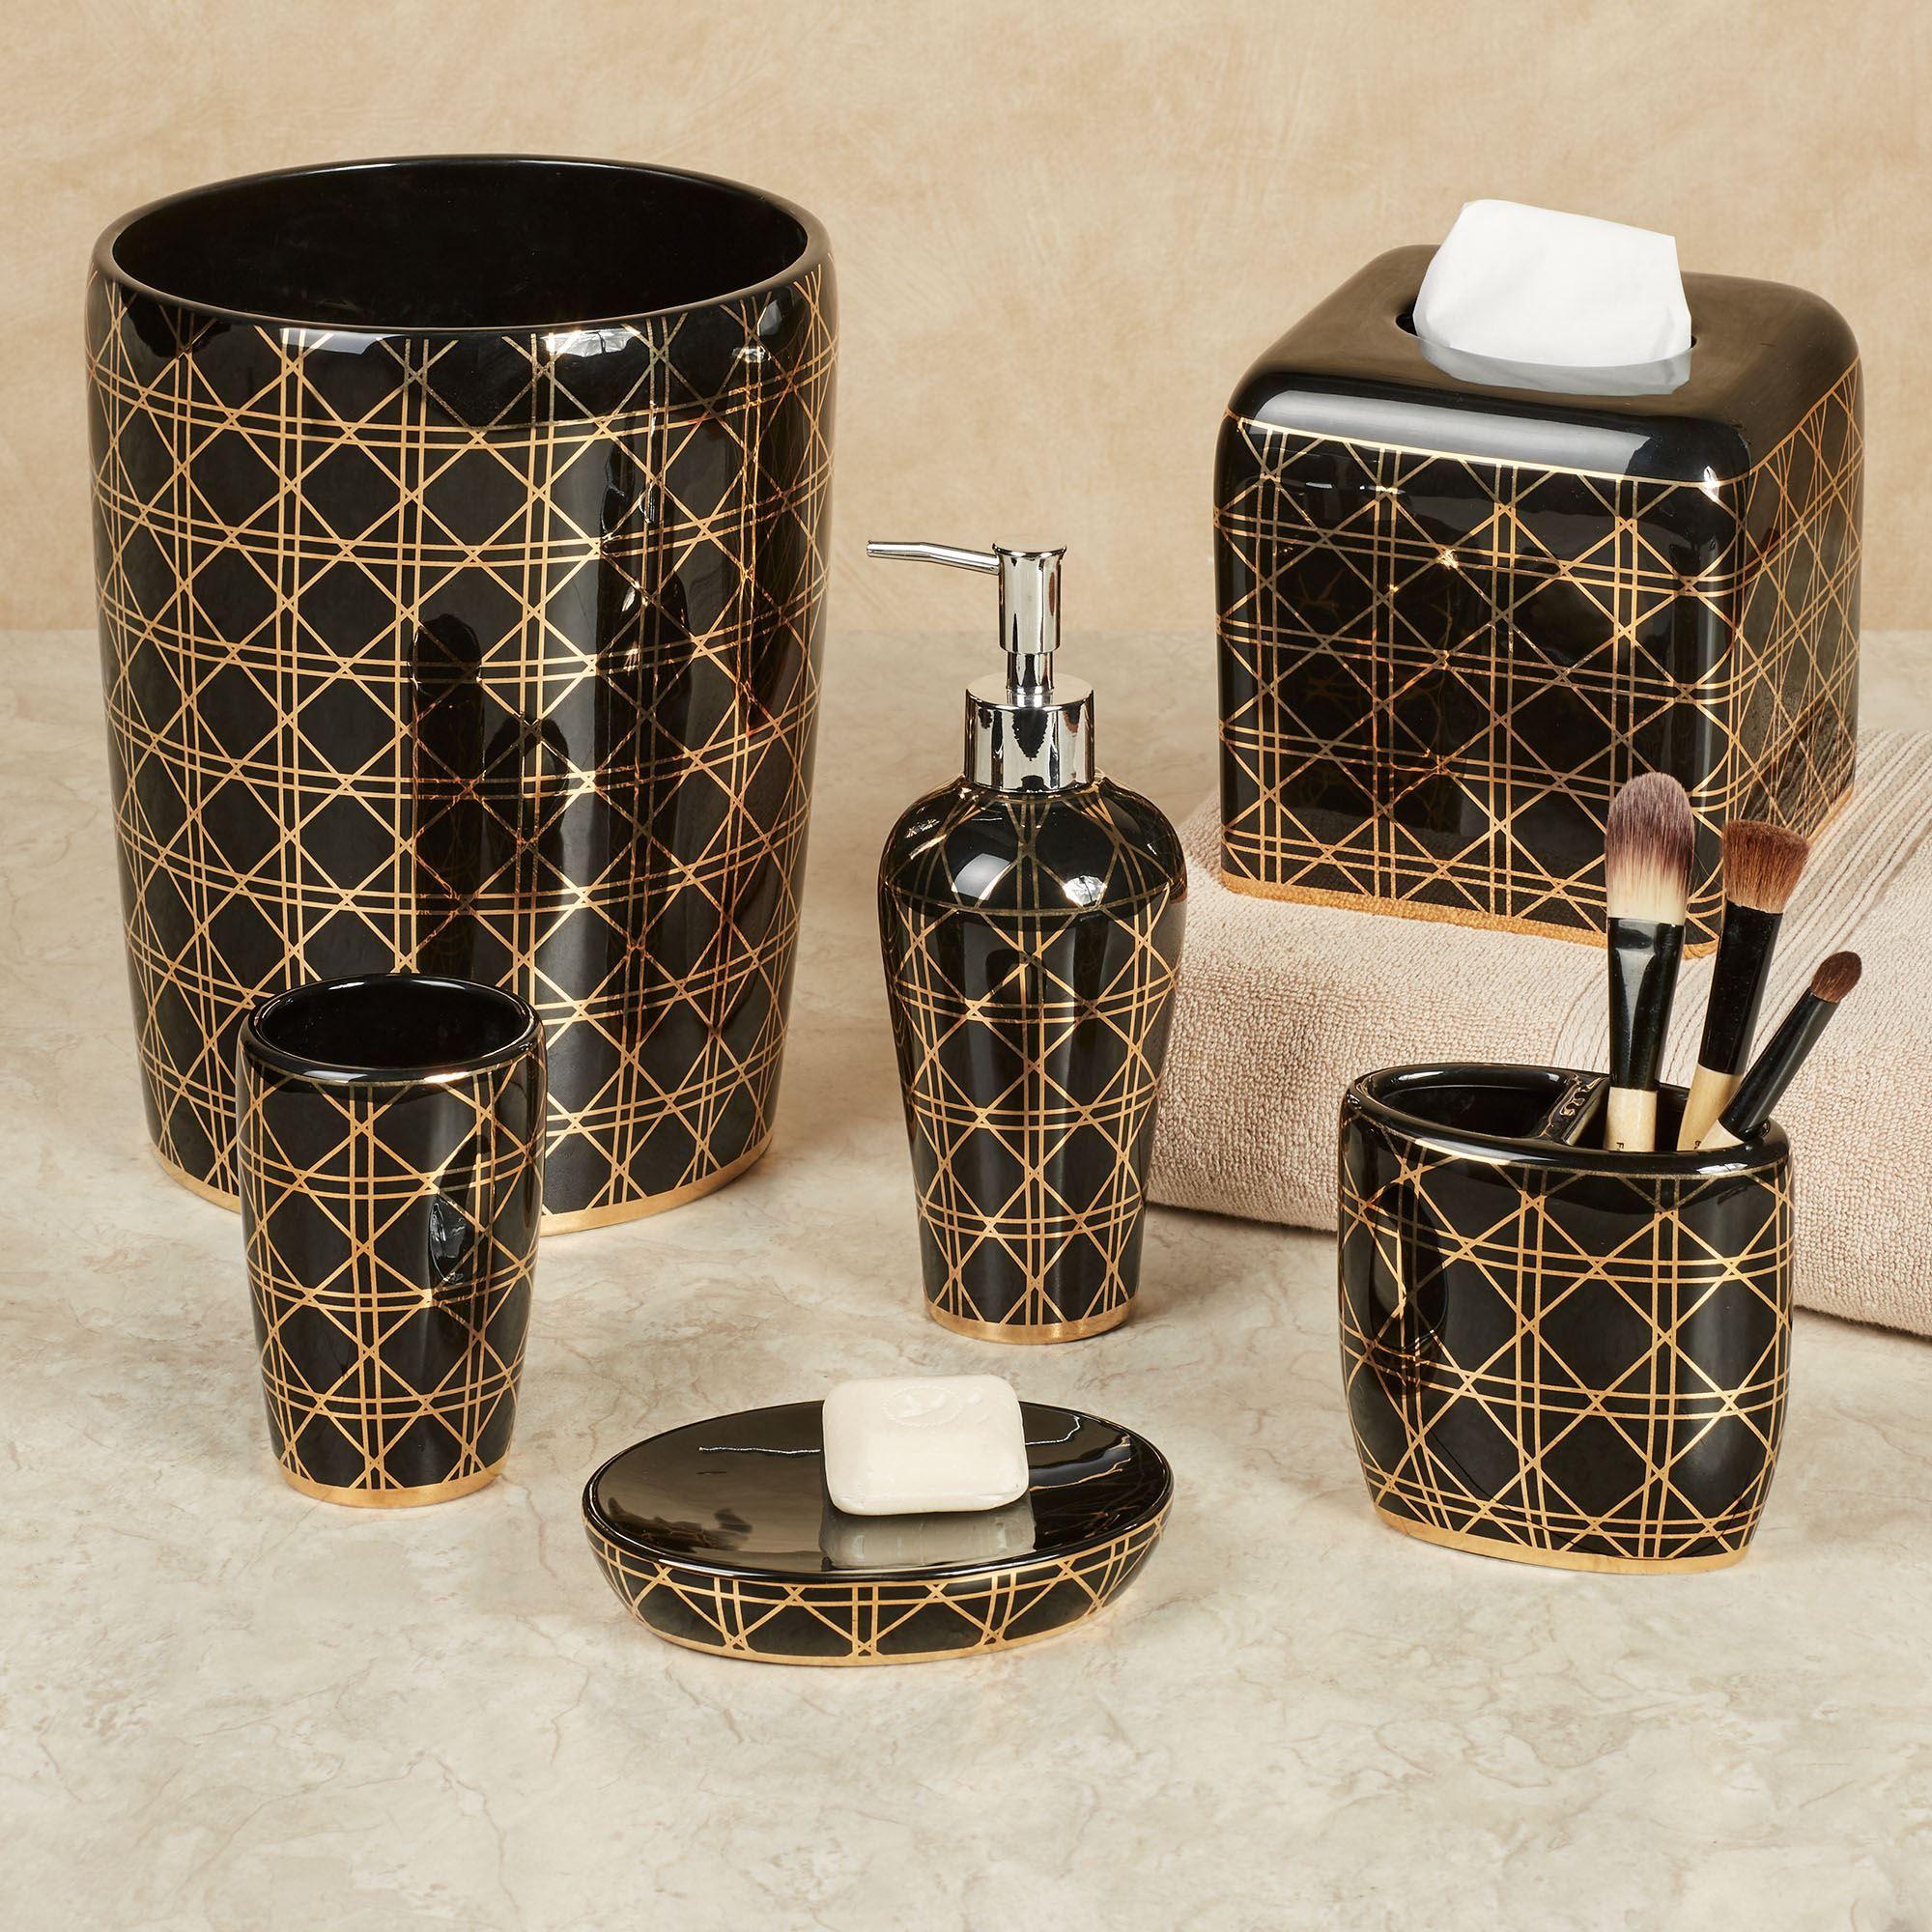 Beauty Black And Gold Geometric Bath Accessories